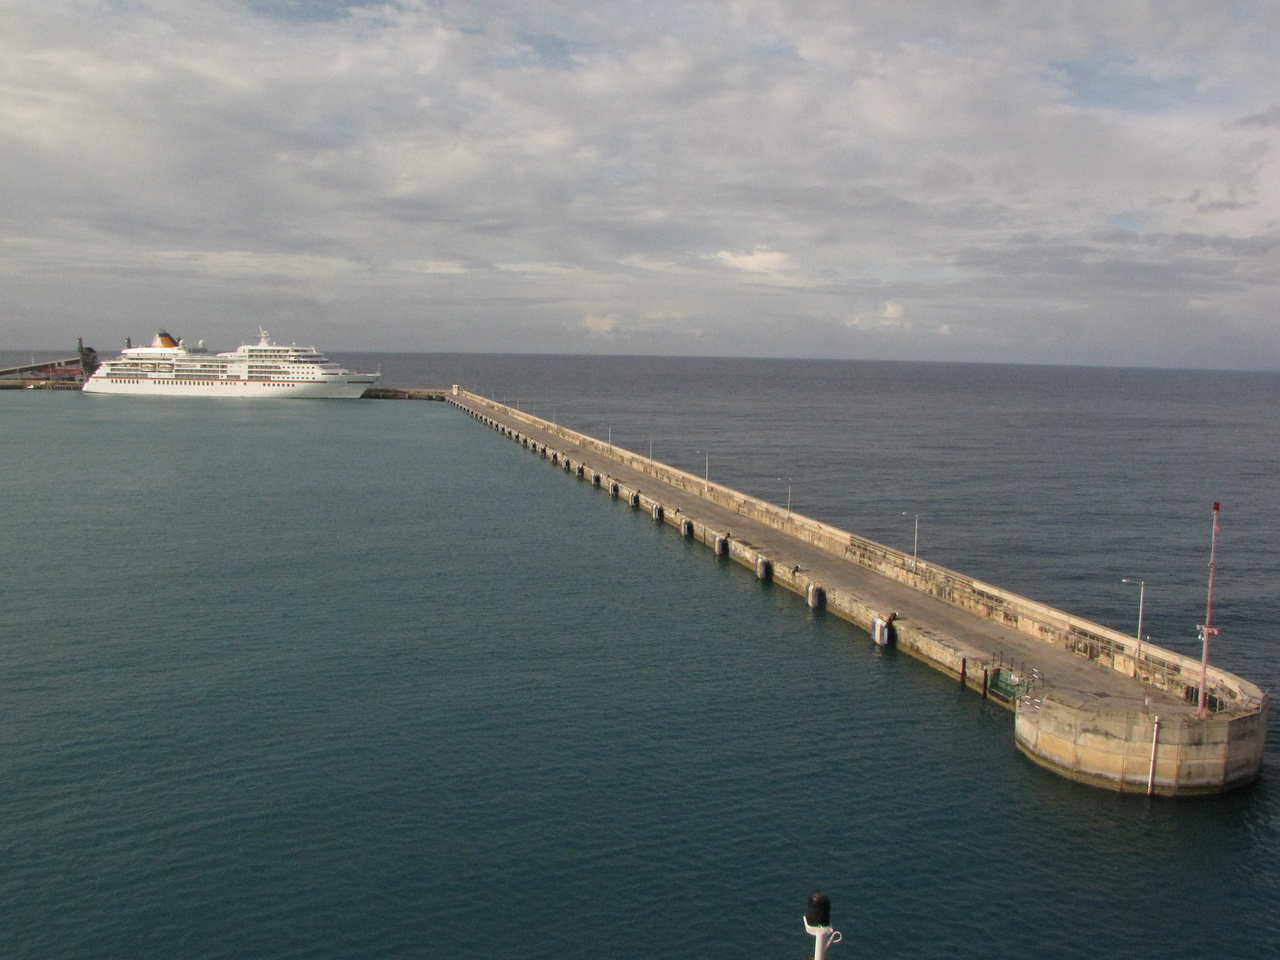 We arrive at Bridgetown, Barbados on Friday morning.